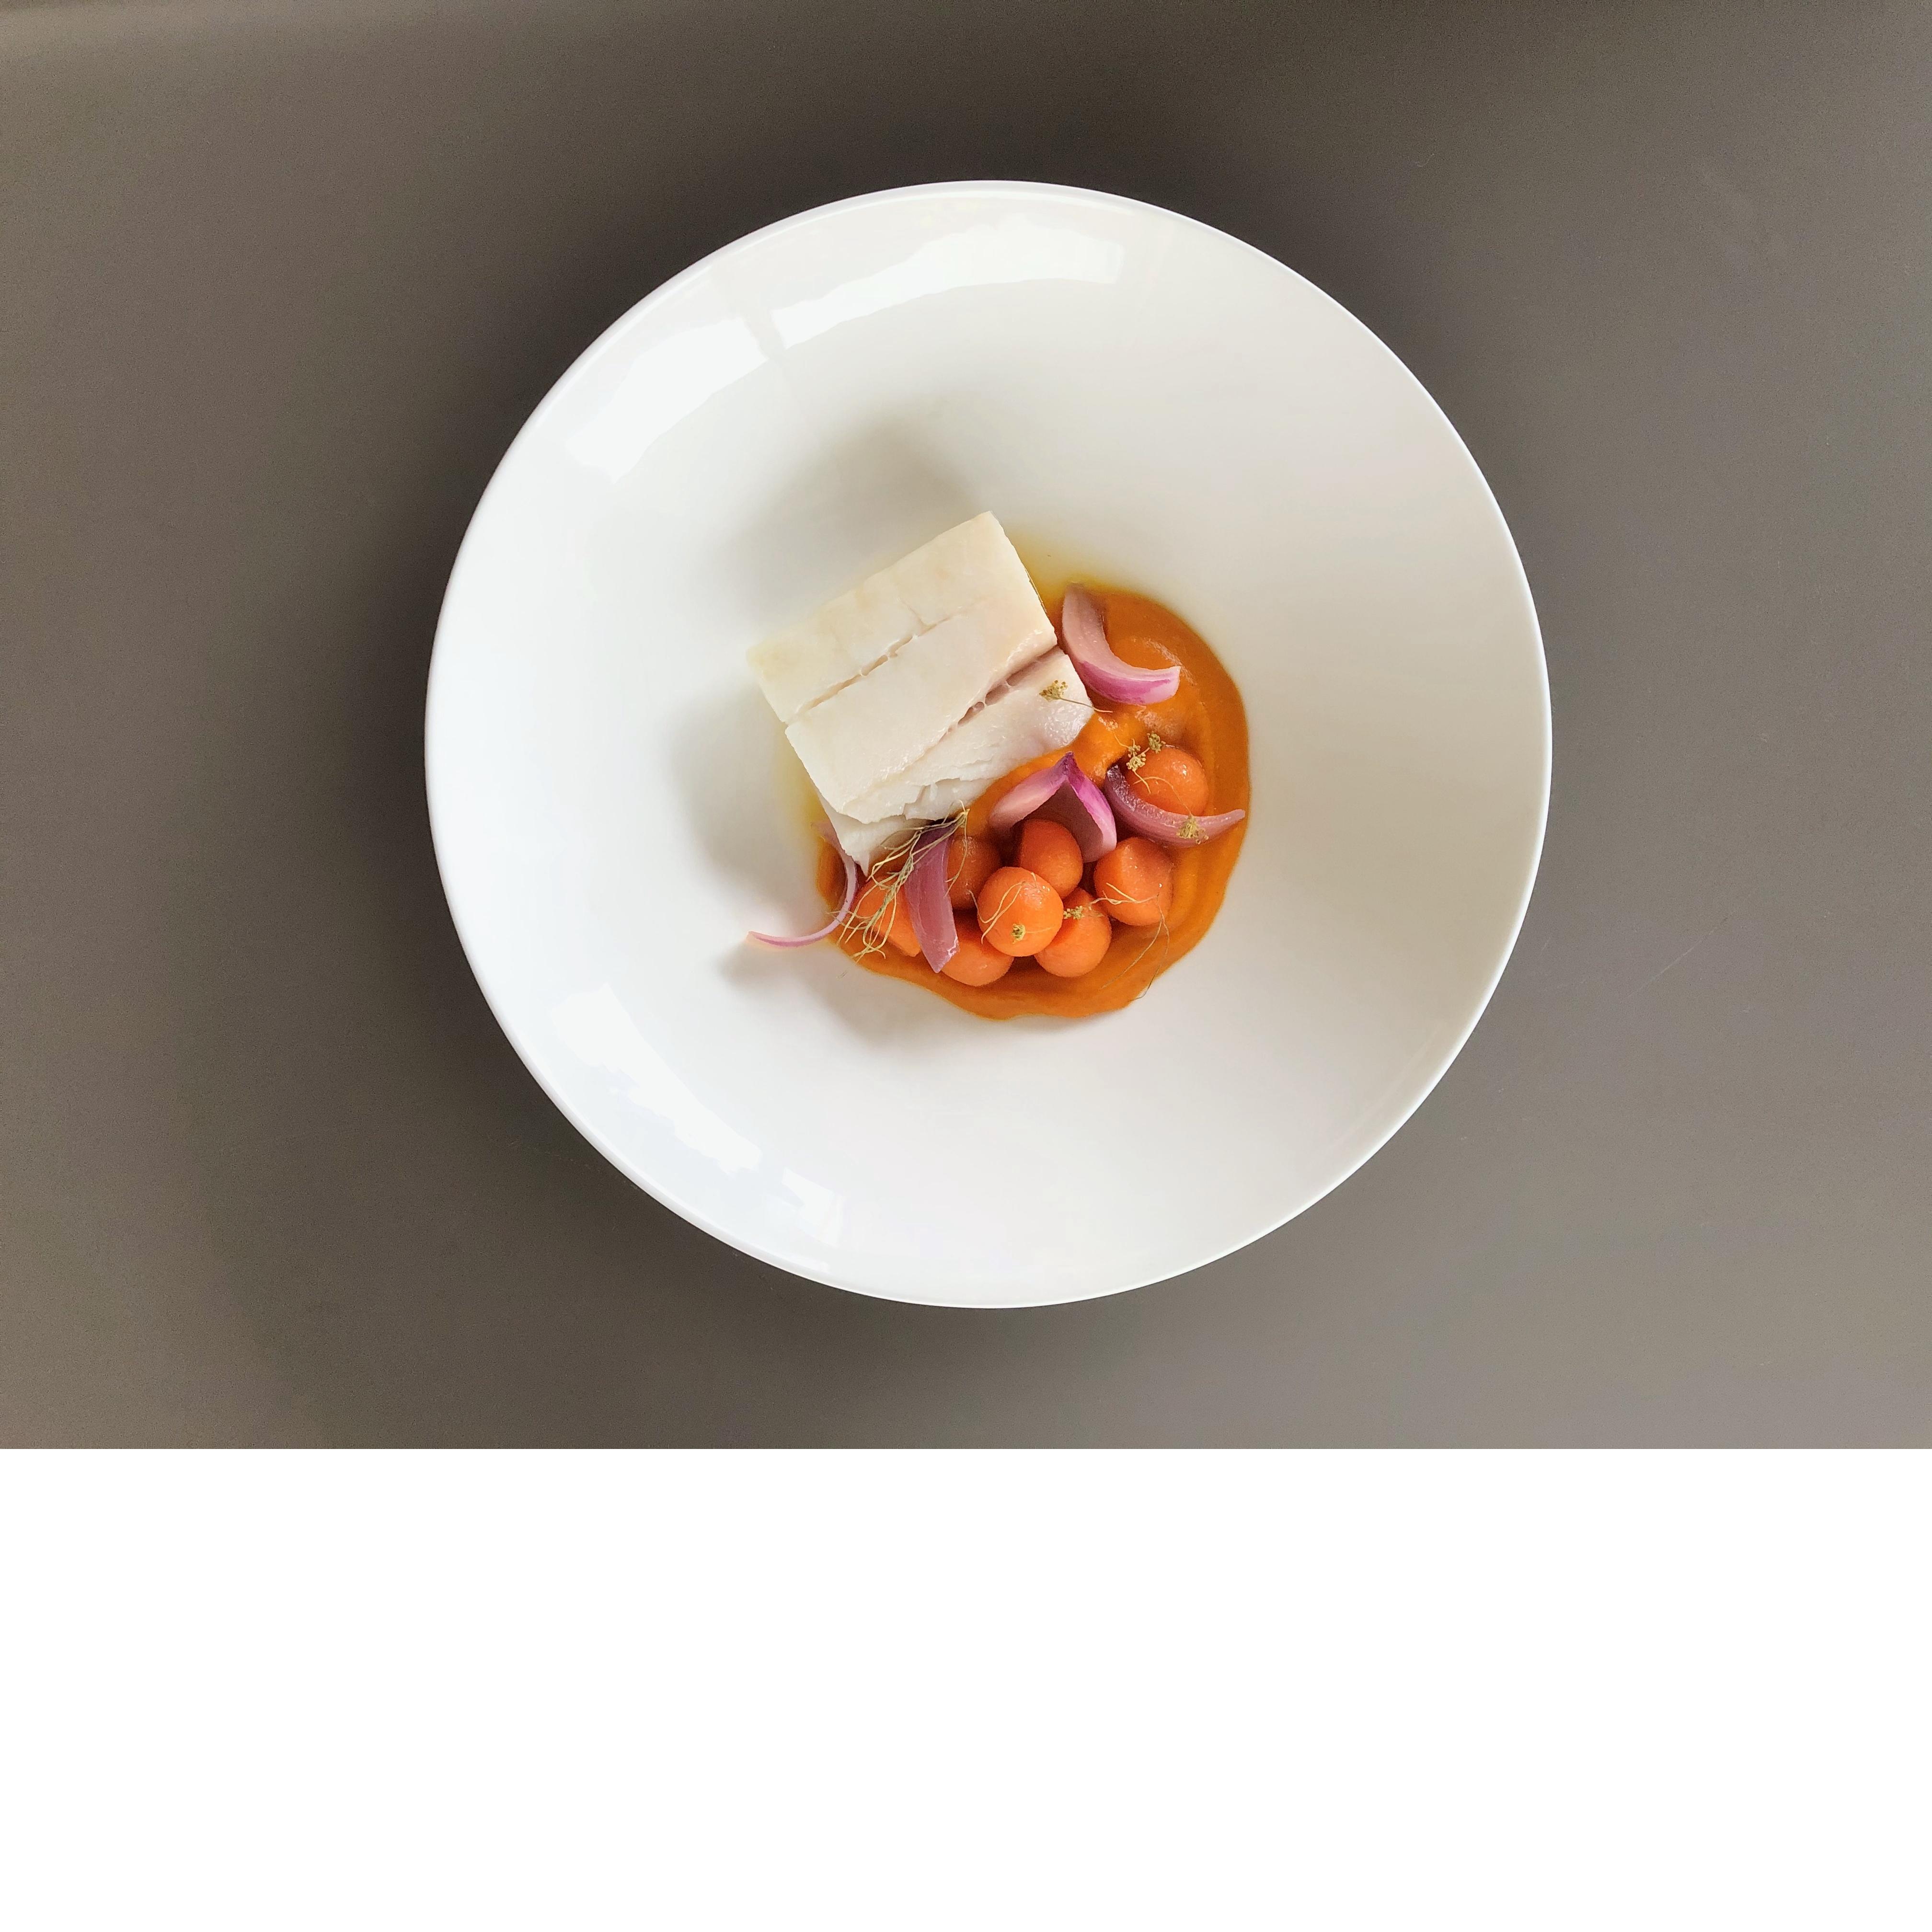 Kabeljau / Kürbispüree / Kürbisgemüse / Glasierte rote Zwiebeln